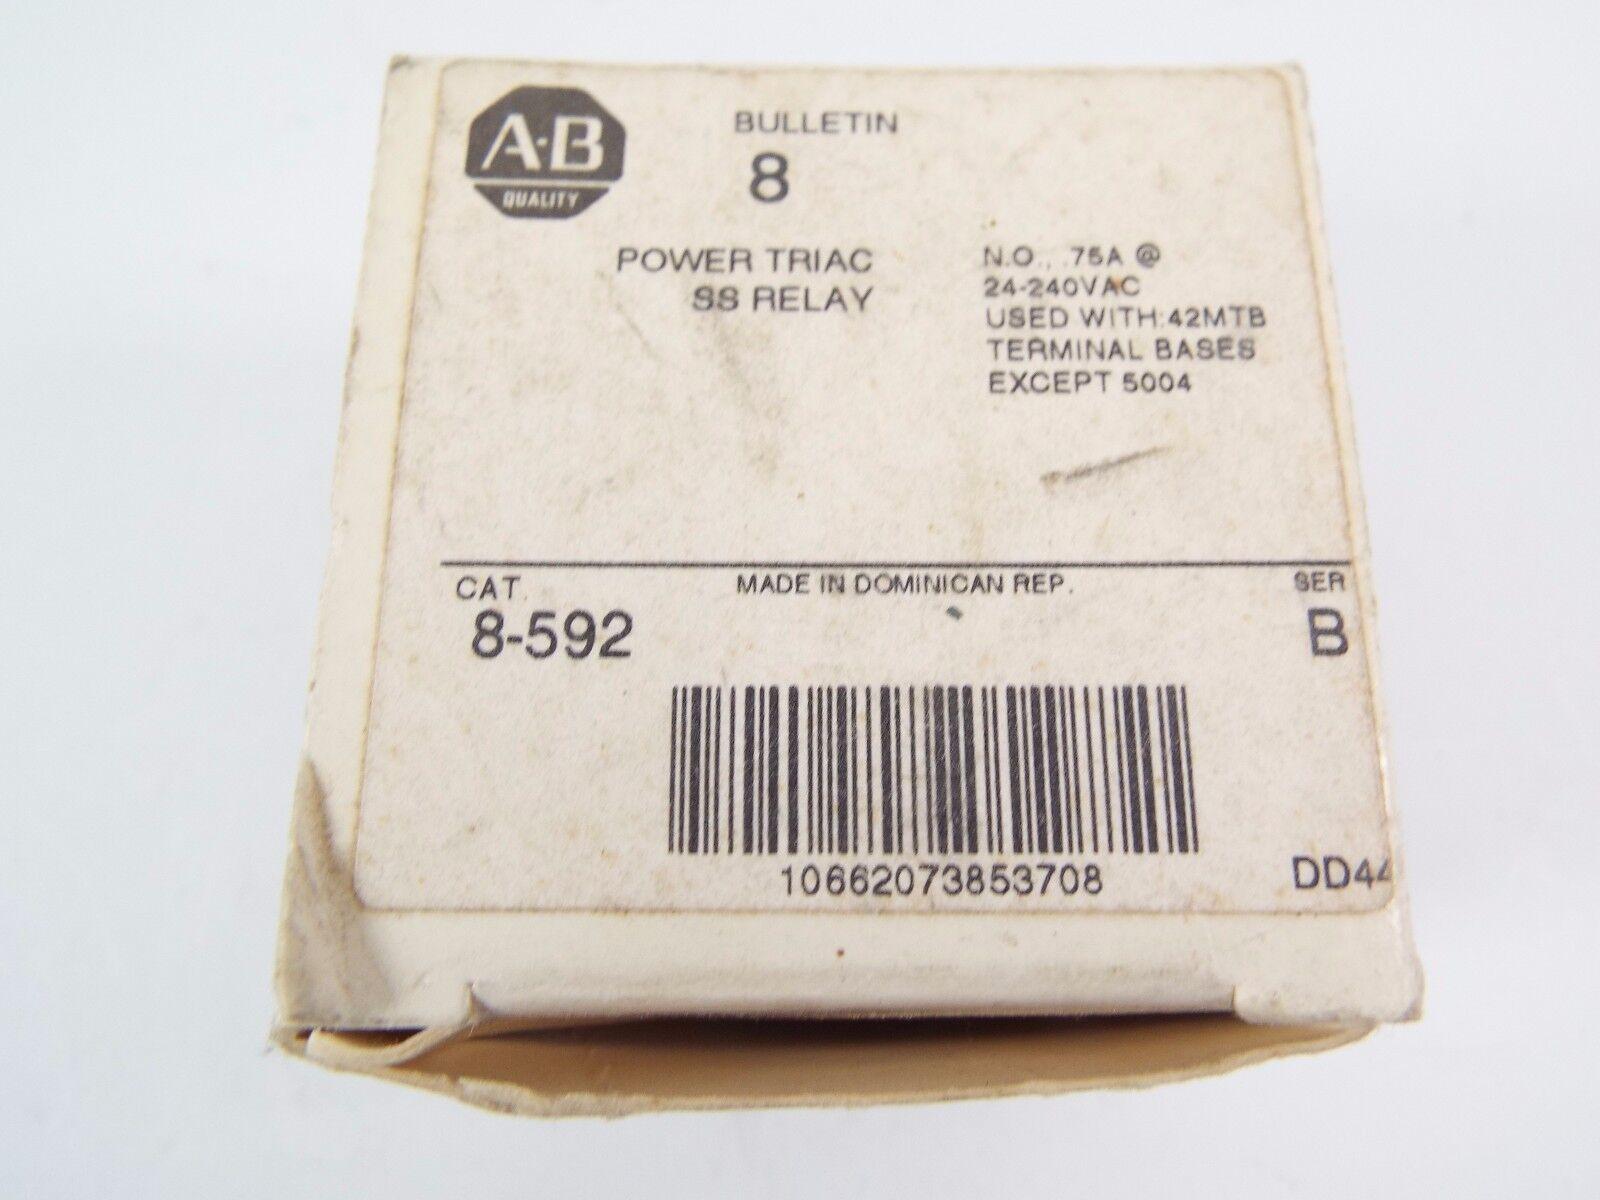 10289 Allen Bradley 8 592 Relay Triac 24 240 Vac Ebay Solid State Stock Photo